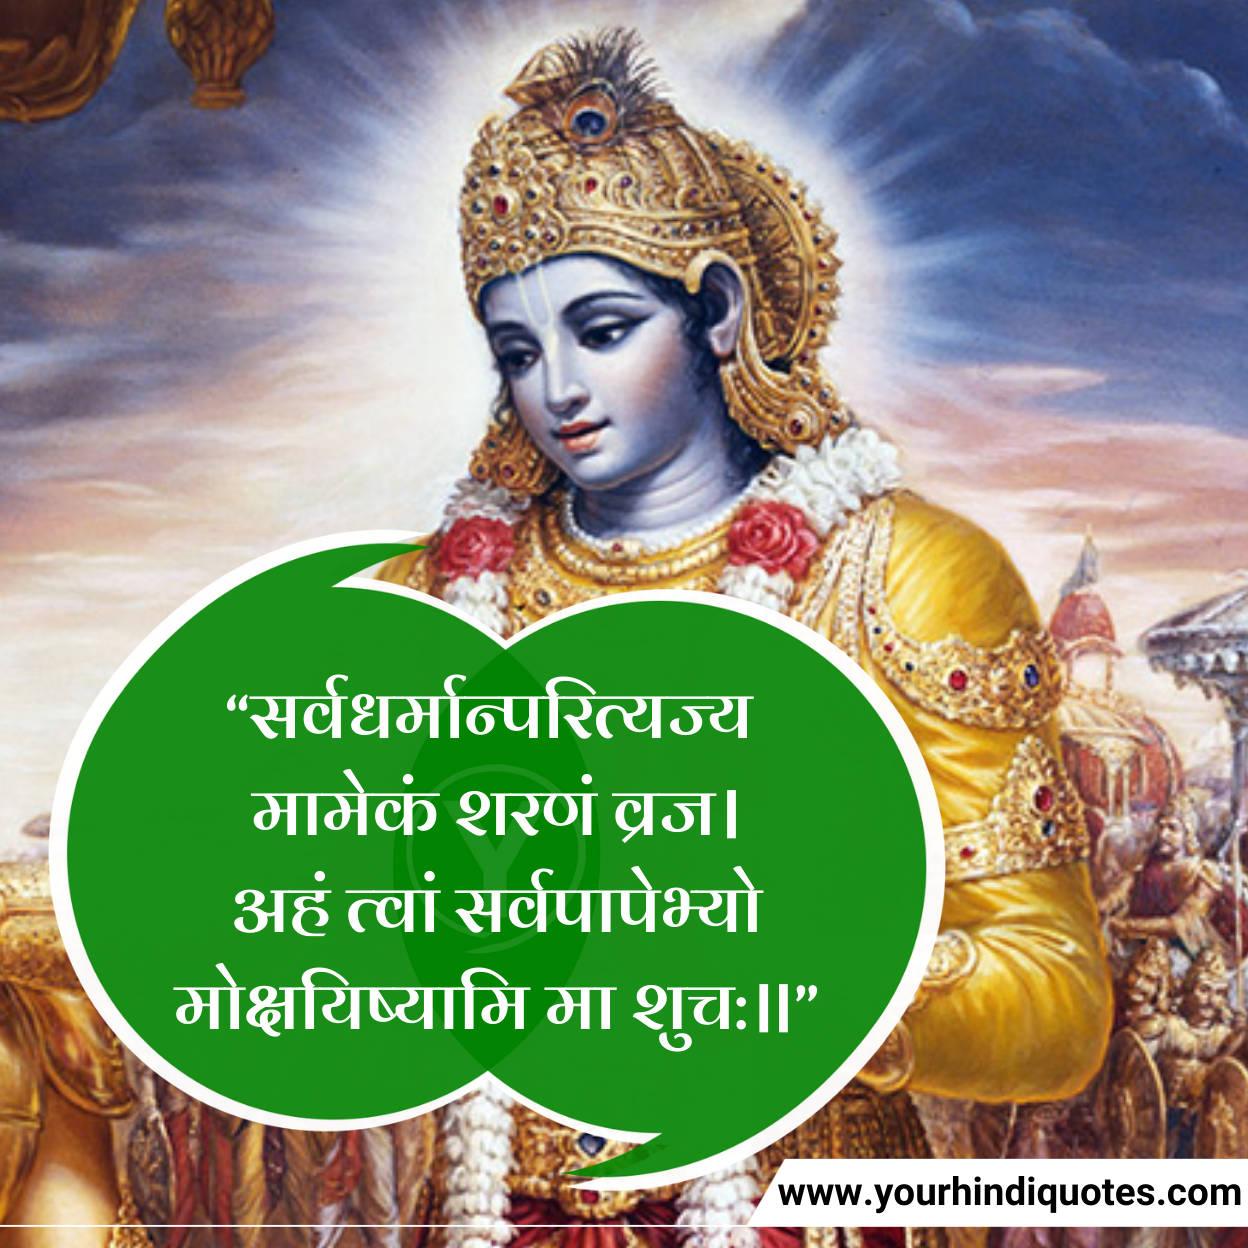 Best Shlok Gita in Hindi